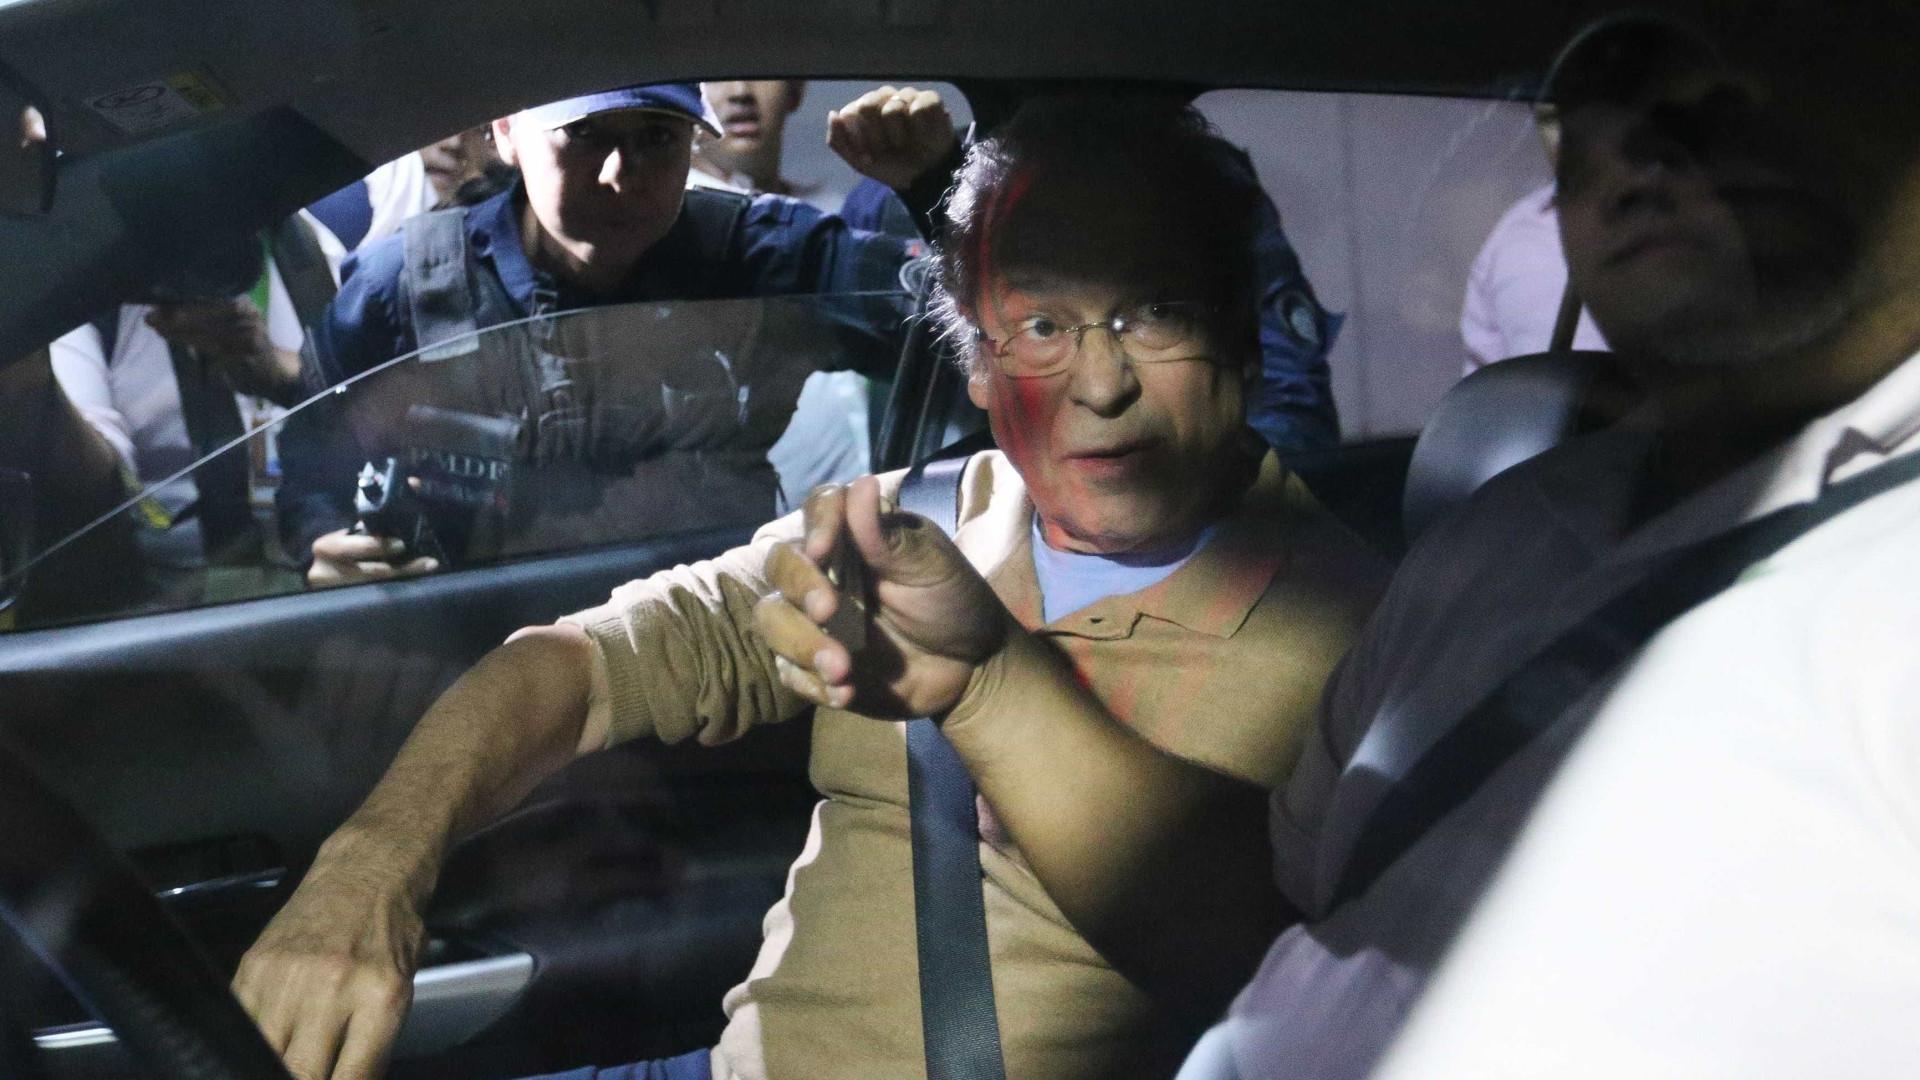 Tribunal federal nega pedido de desbloqueio de bens de José Dirceu